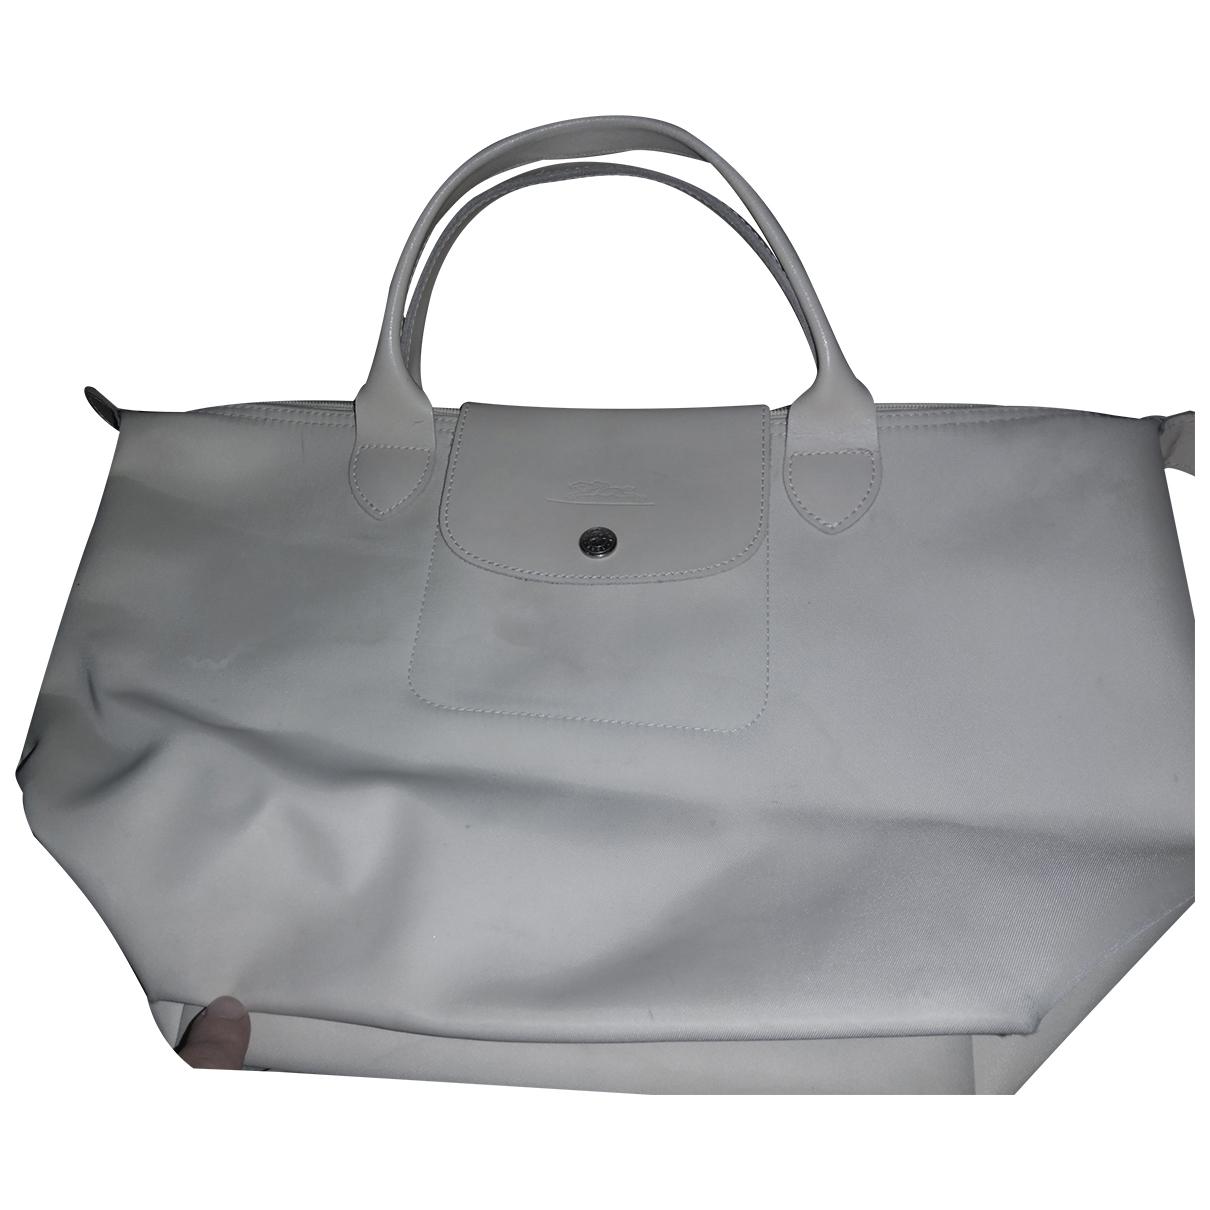 Longchamp Pliage  Beige handbag for Women \N